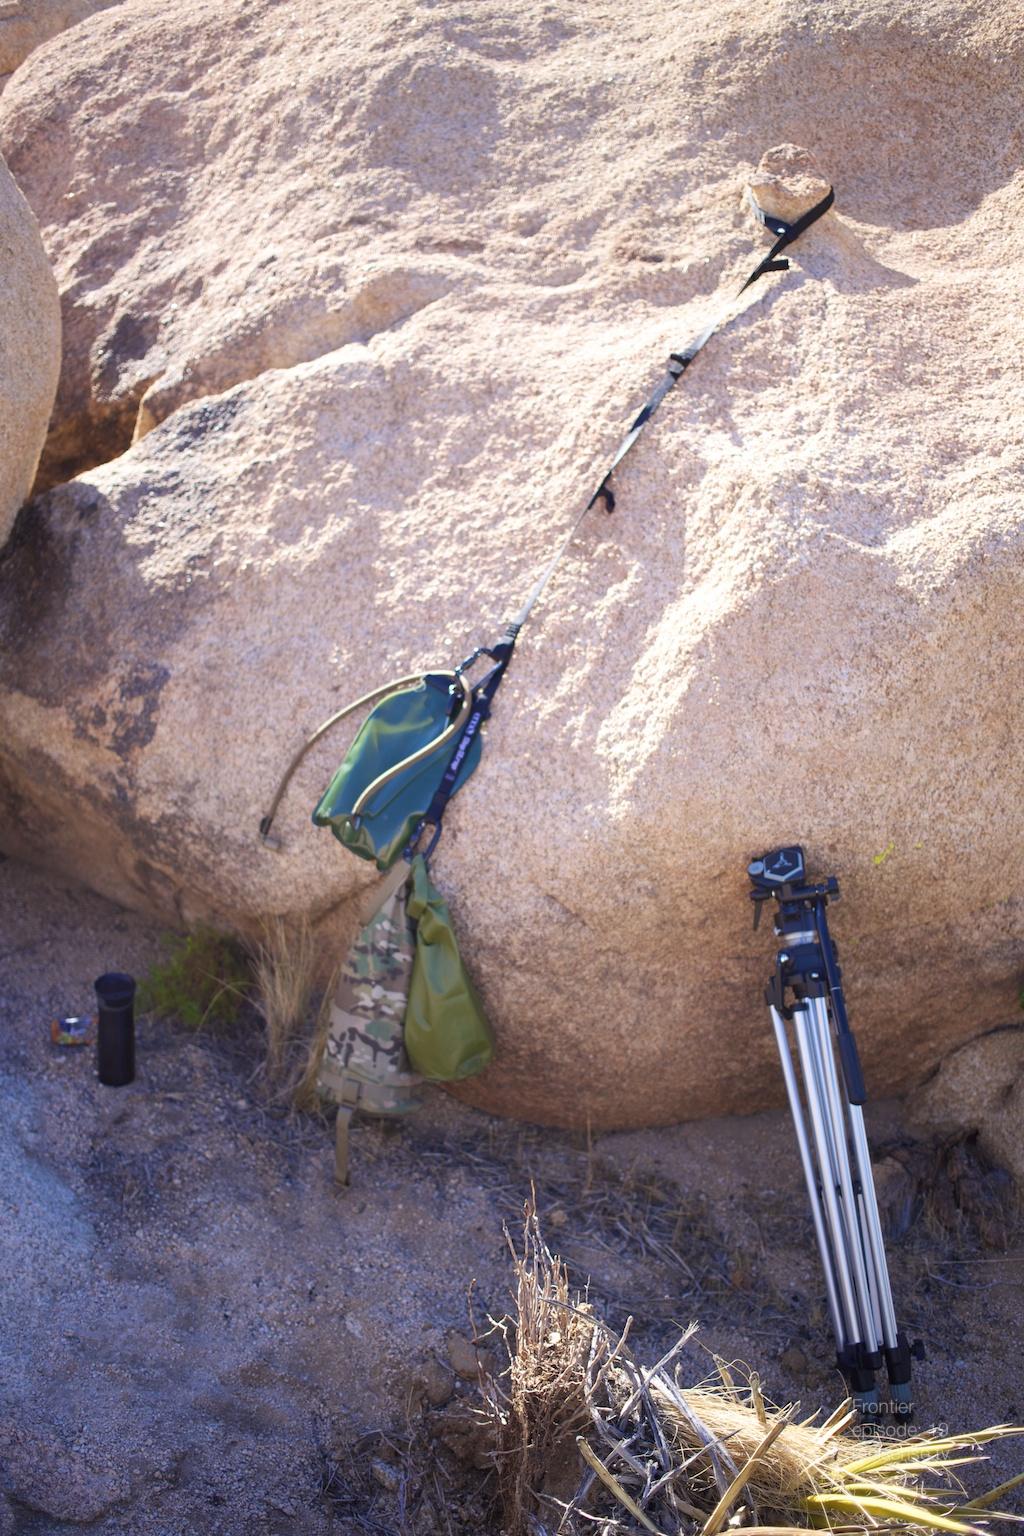 Joshua Tree - Gear and tripod setup in camp